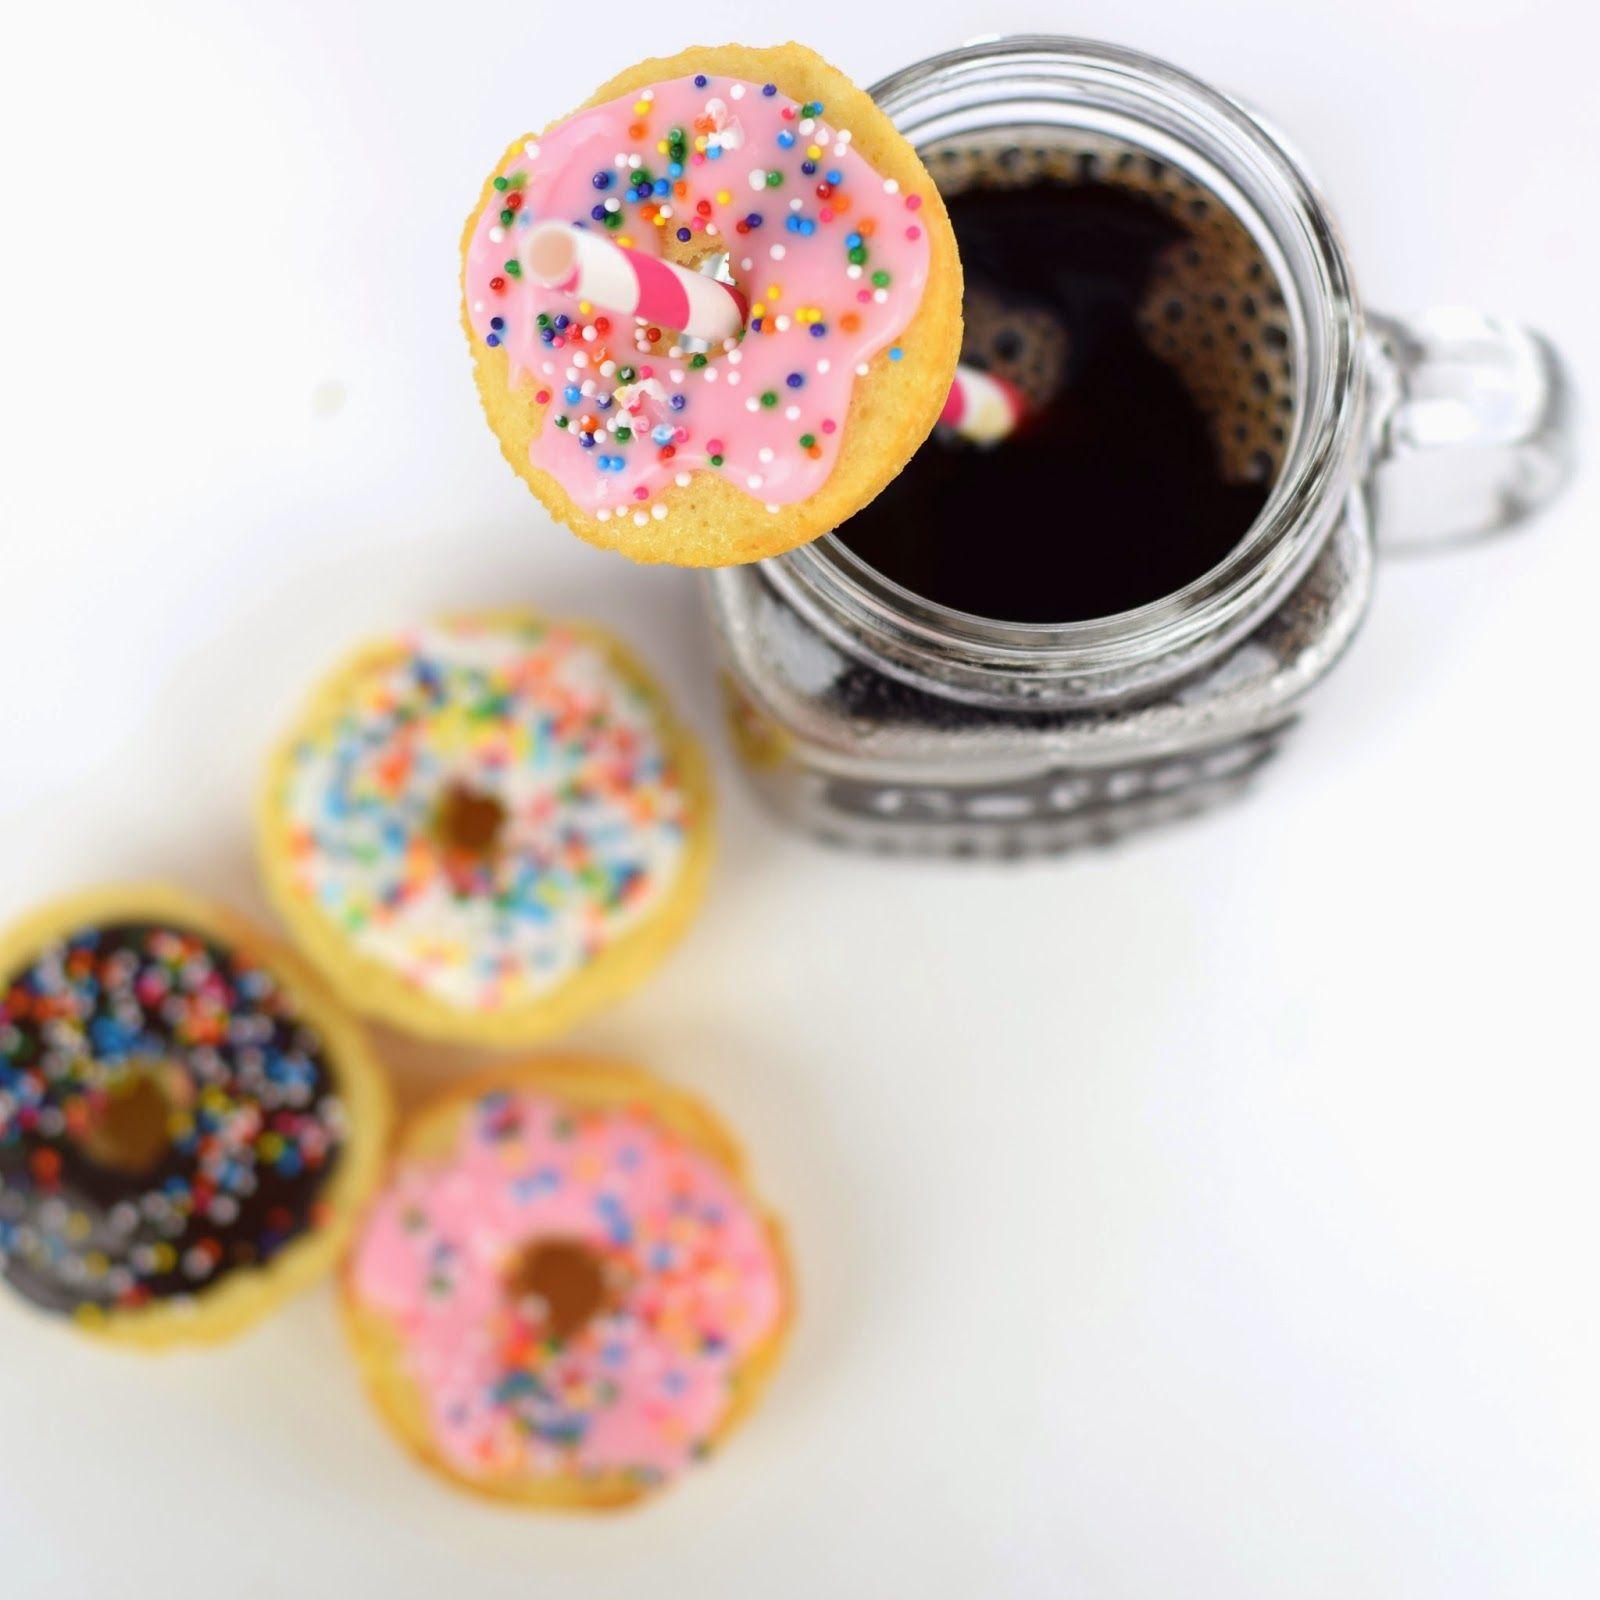 Mini Donut & Coffee Recipe | http://www.publiclivessecretrecipes.com/2015/03/coffee-mini-donuts-recipe.html